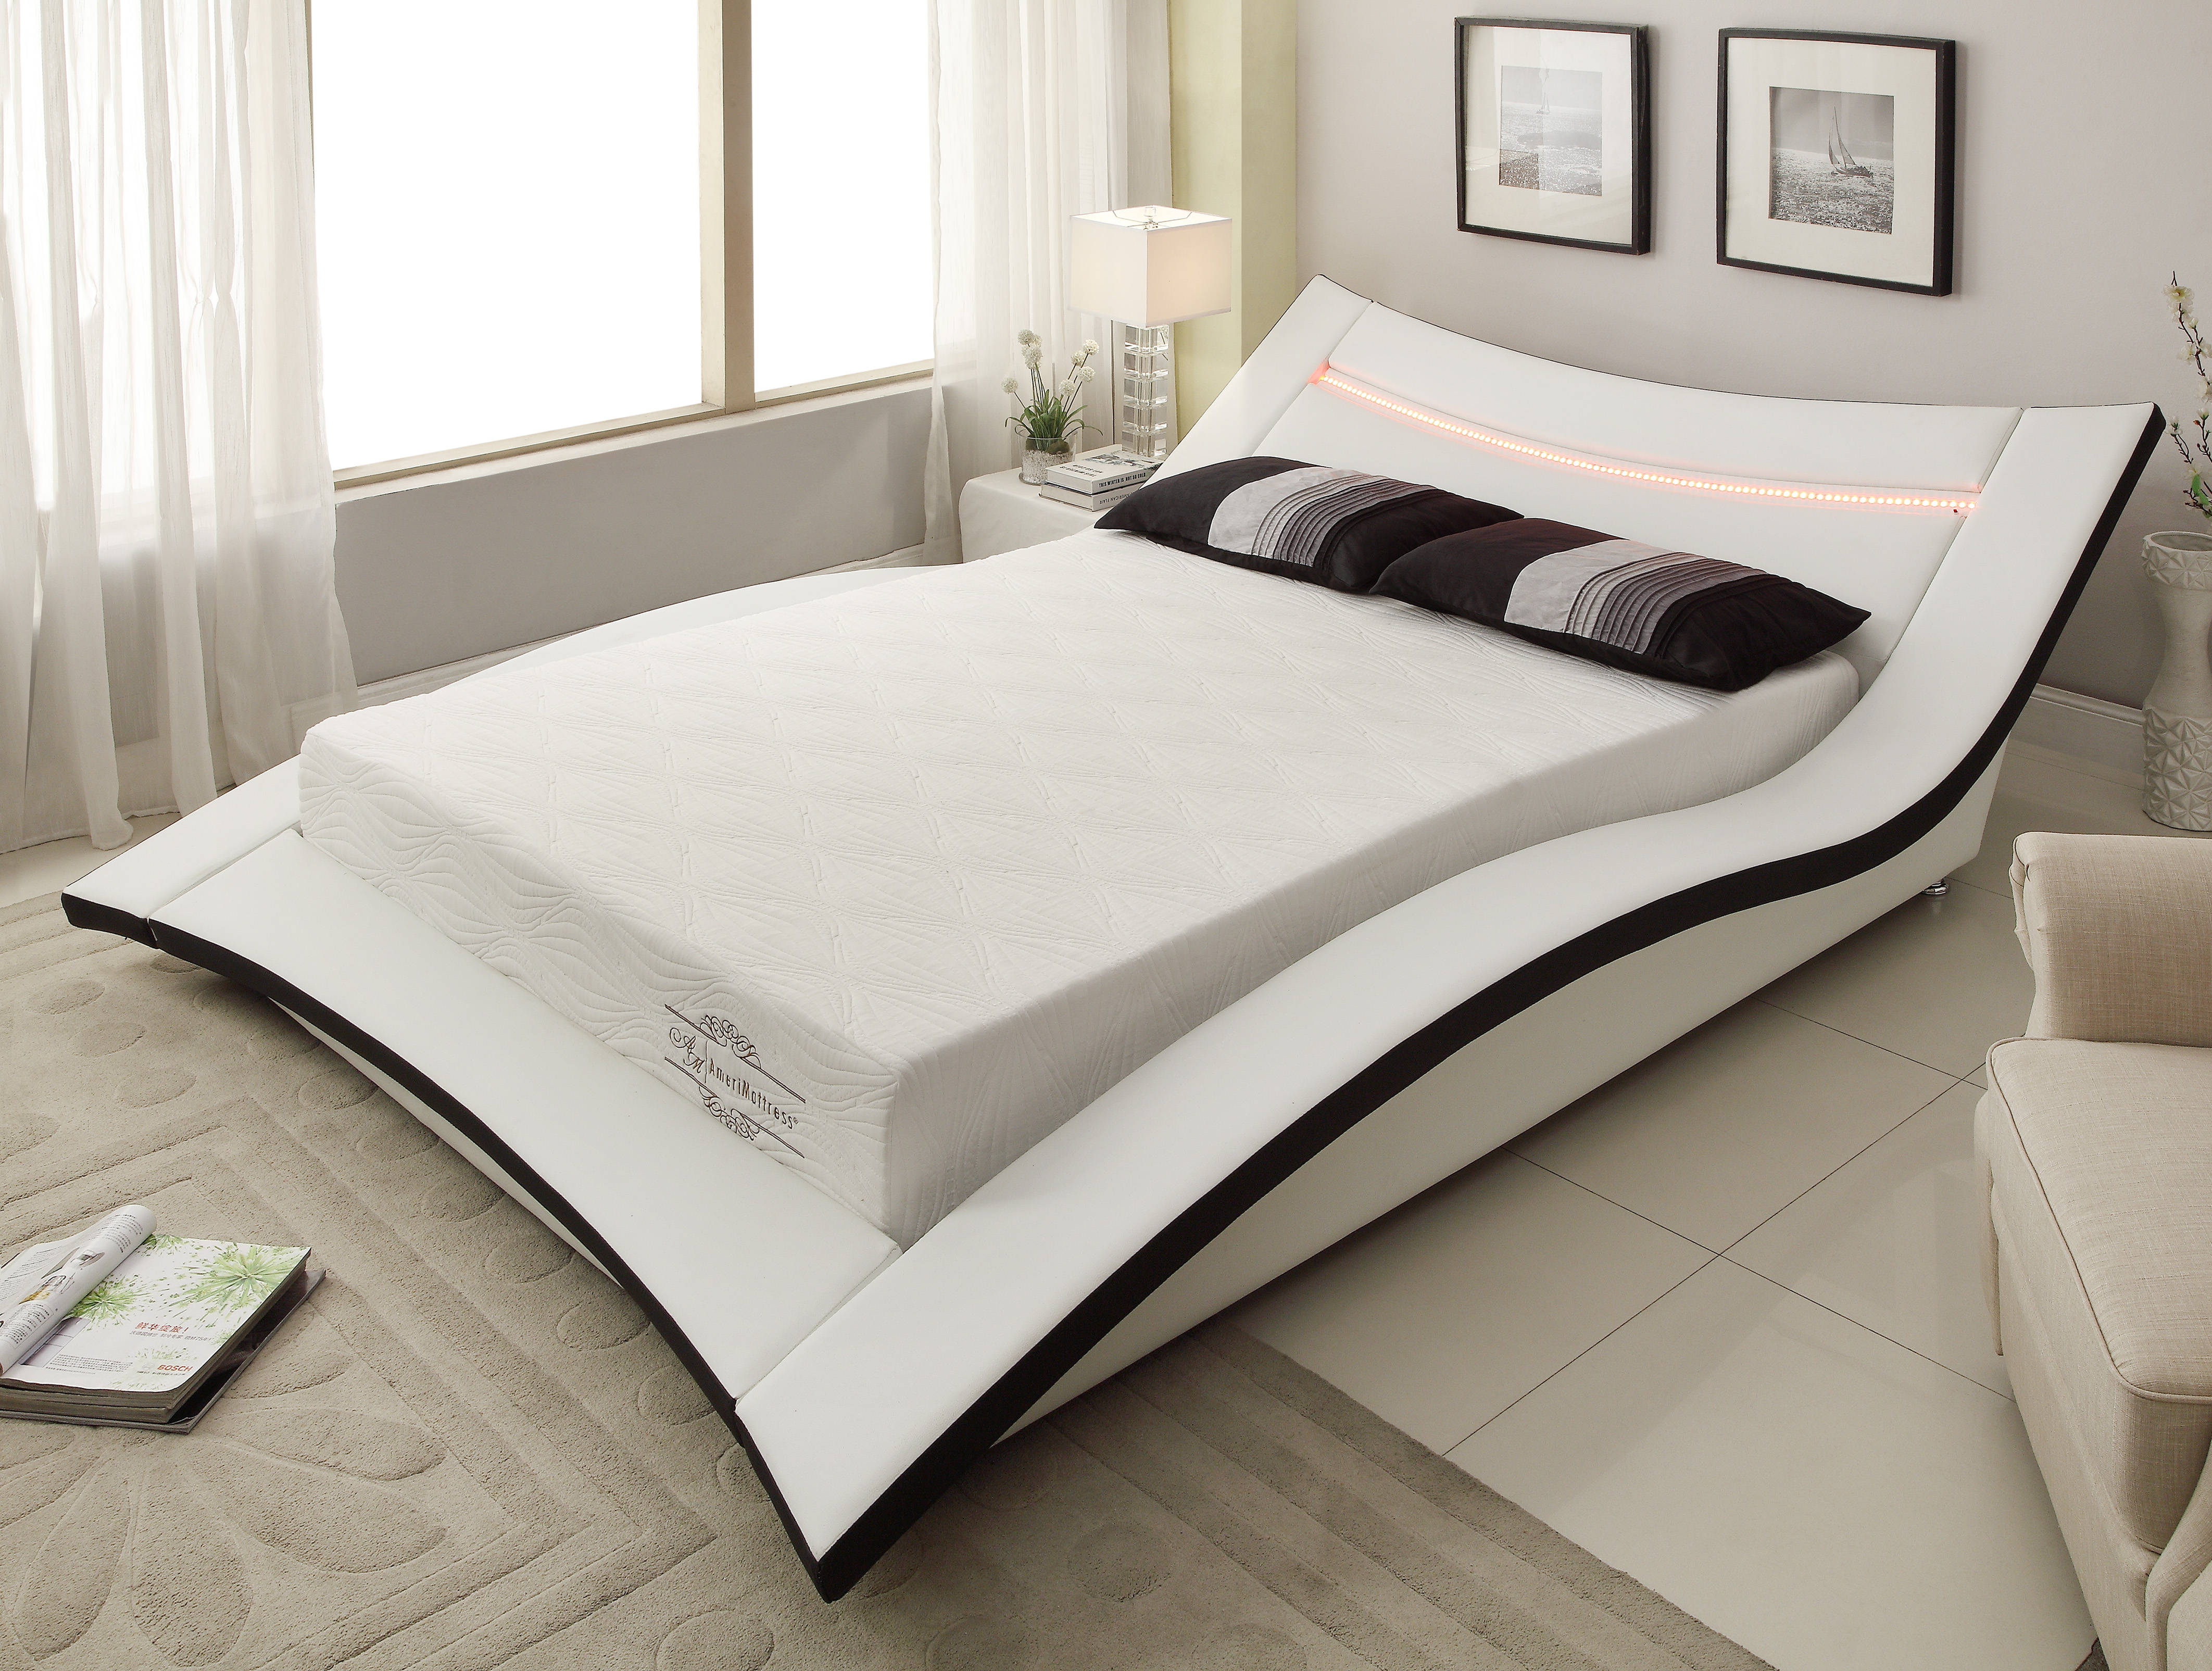 California king mattress Waterbed 10inch Gel Infused Memory Foam Mattress With Certipurus Certified Foam Cal Walmart California King Mattresses